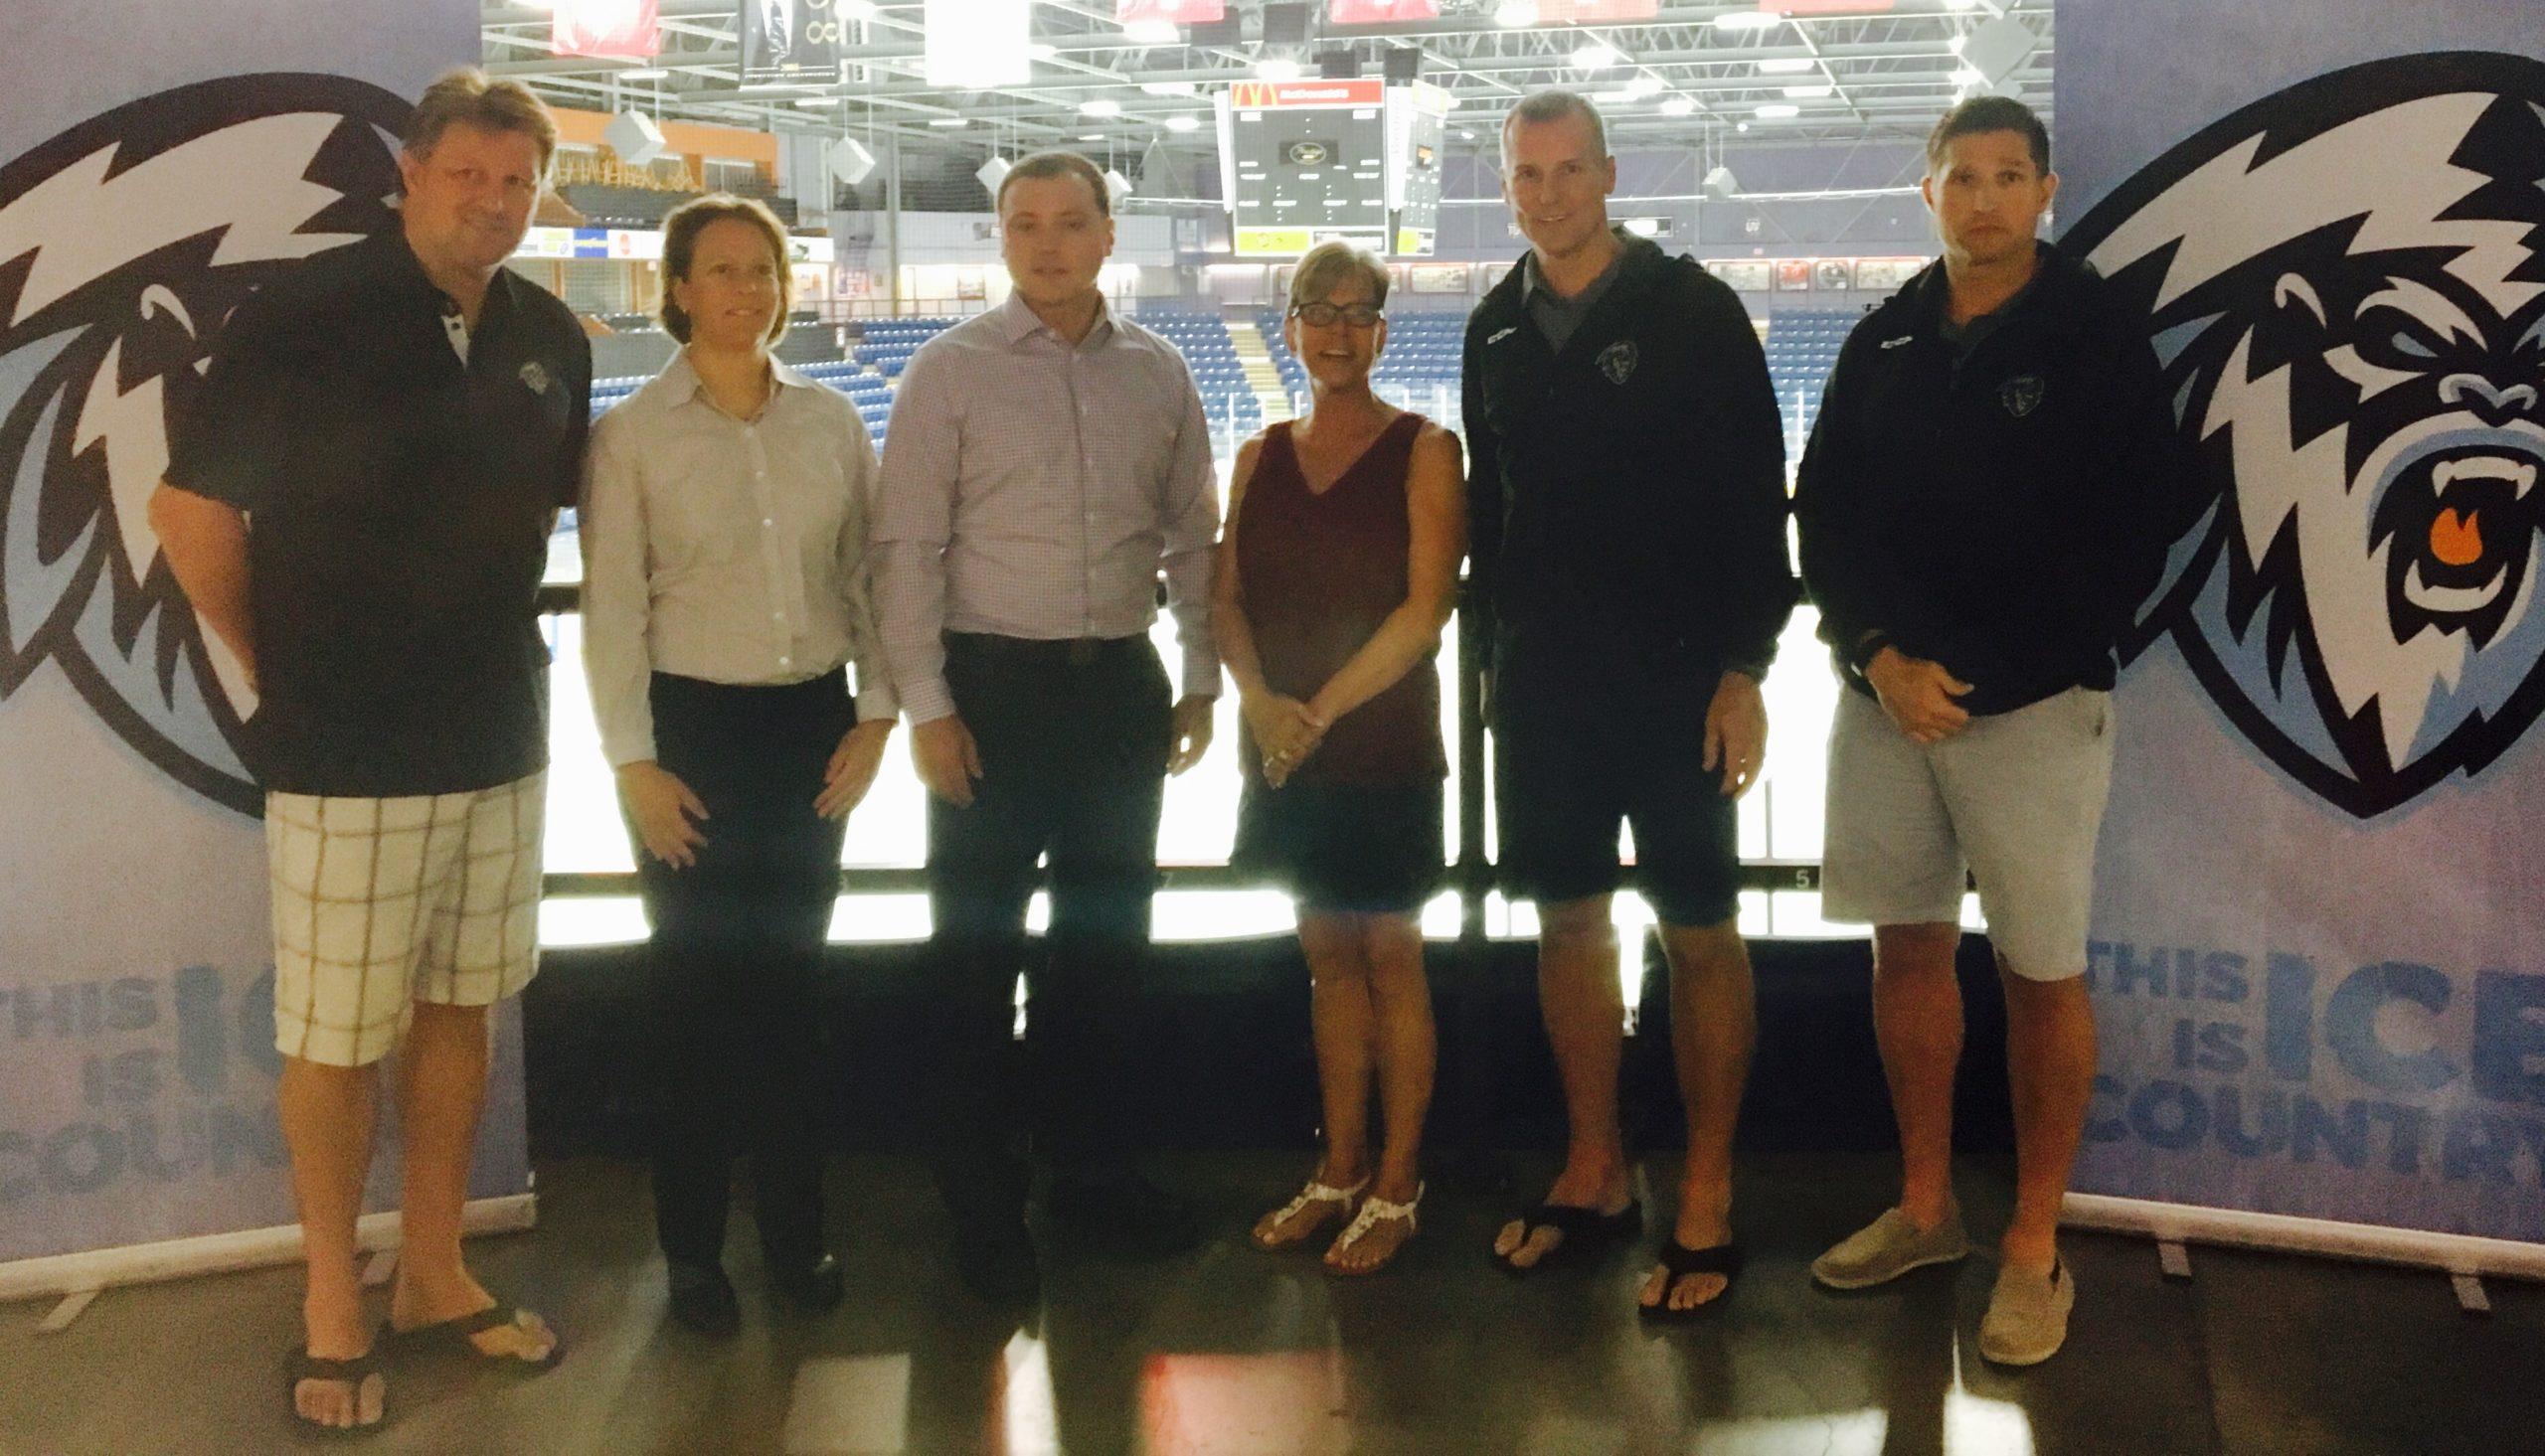 Kootenay ICE partner with East Kootenay bantam/midget teams